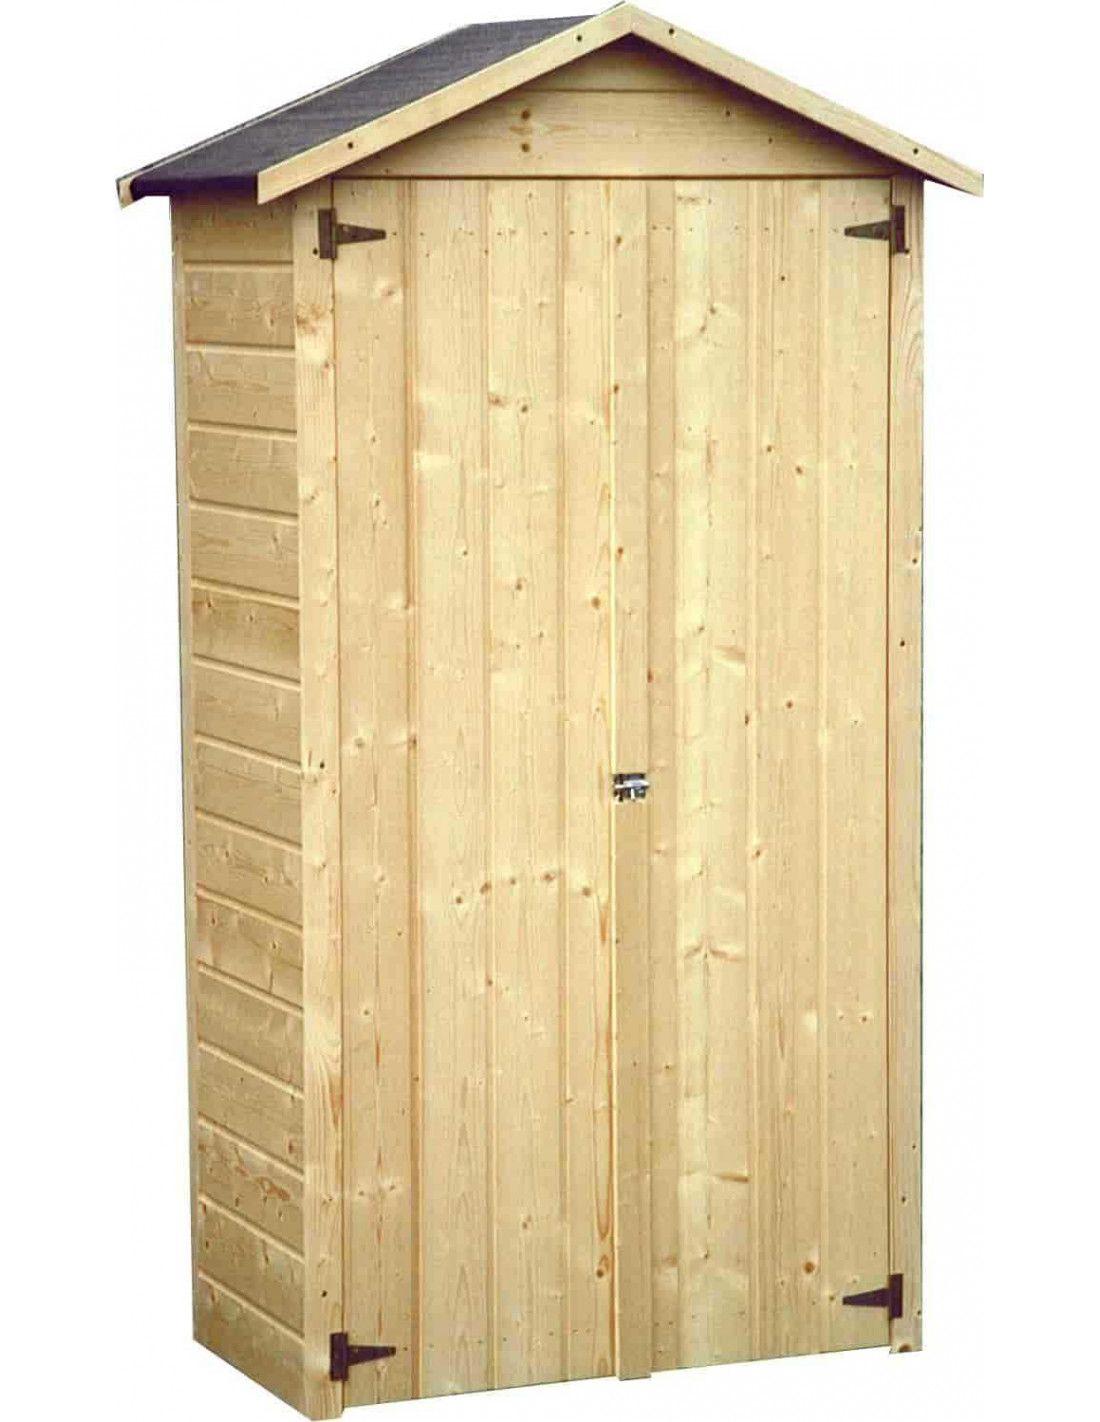 Armarios de exterior armario de madera mod bora 92x51cm - Armarios de madera para jardin ...